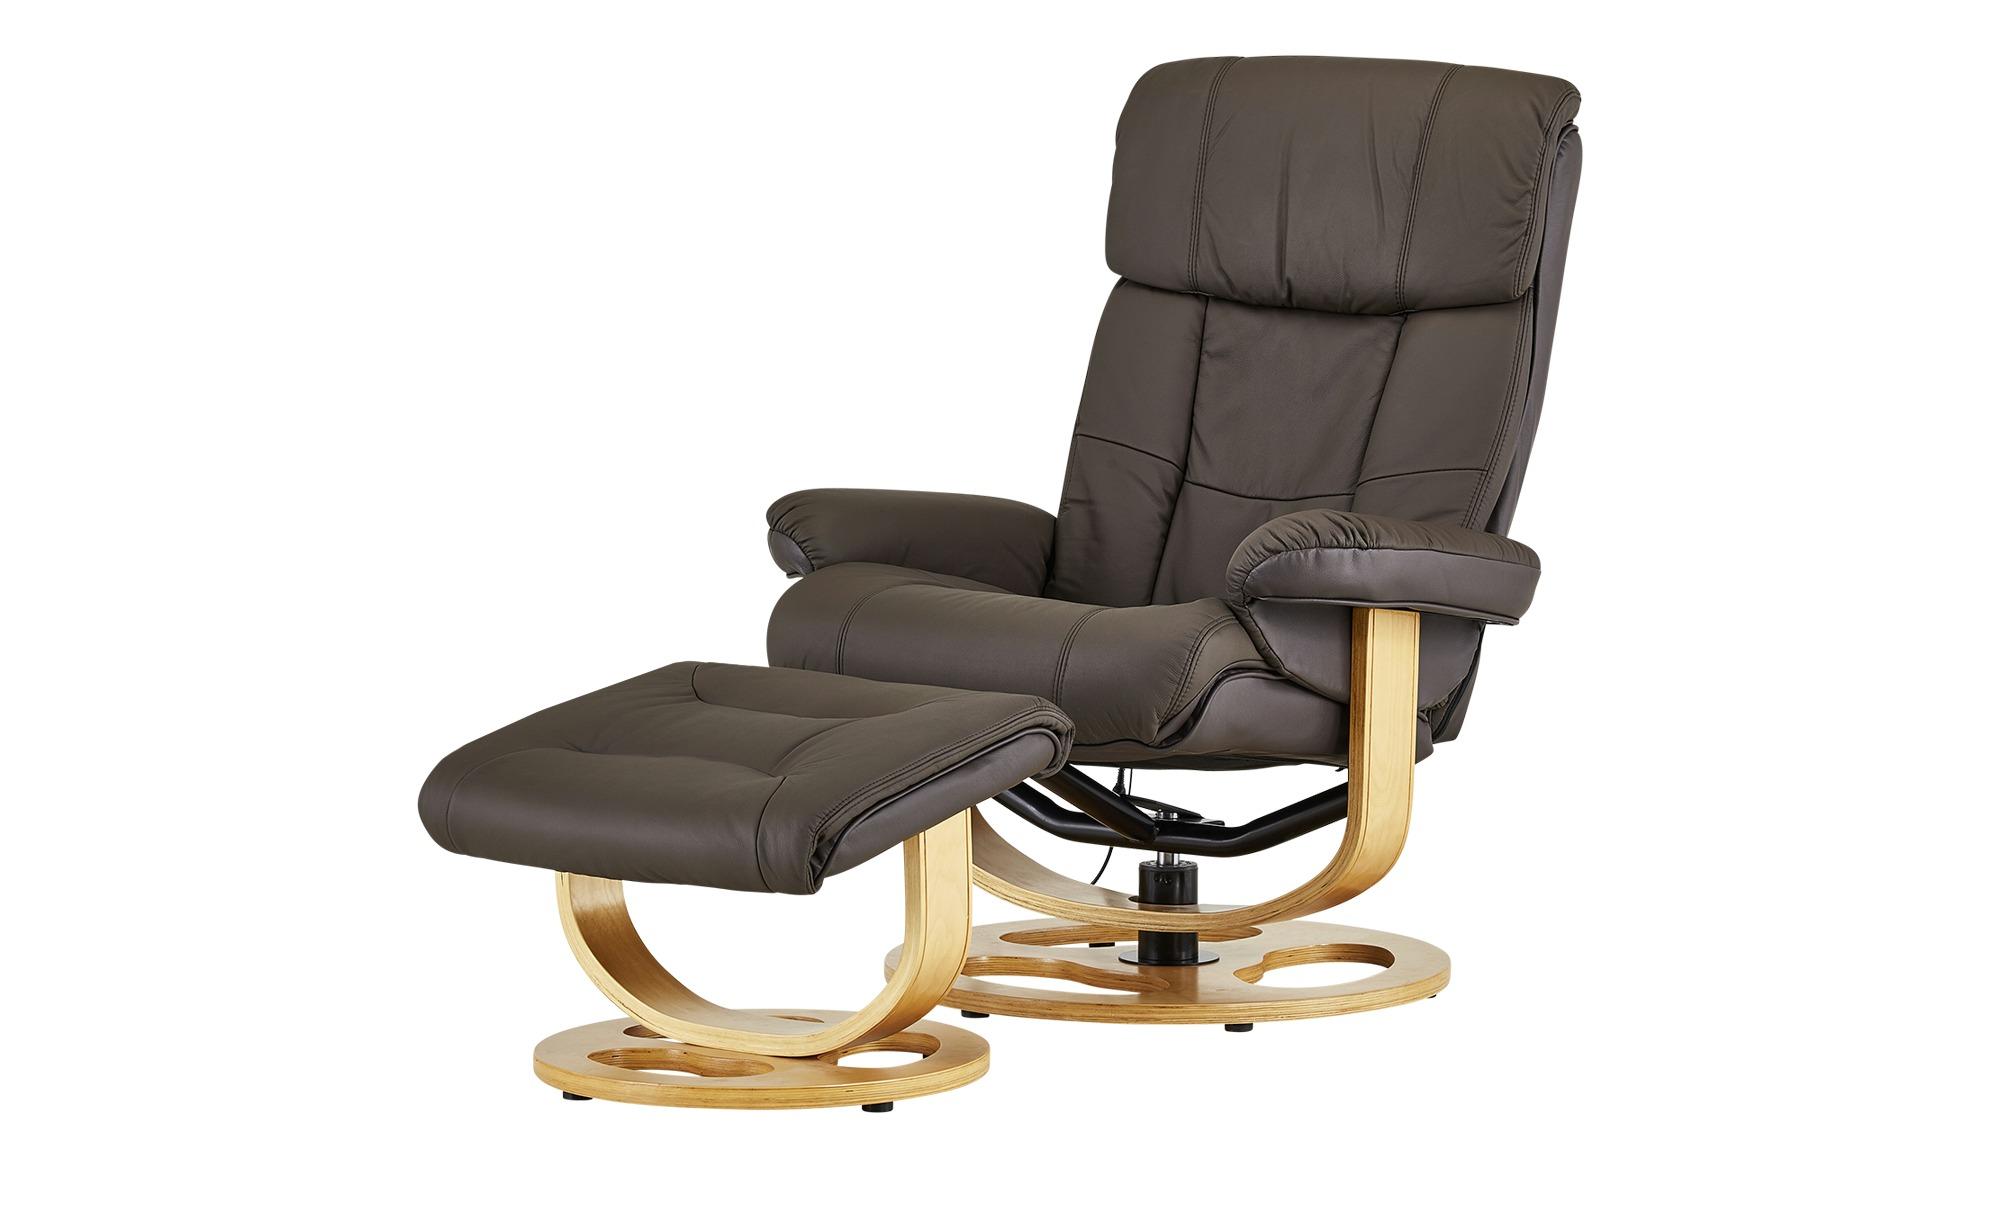 Massagesessel - braun - 85 cm - 107 cm - 89 cm - Polstermöbel > Sessel > Ledersessel - Möbel Kraft